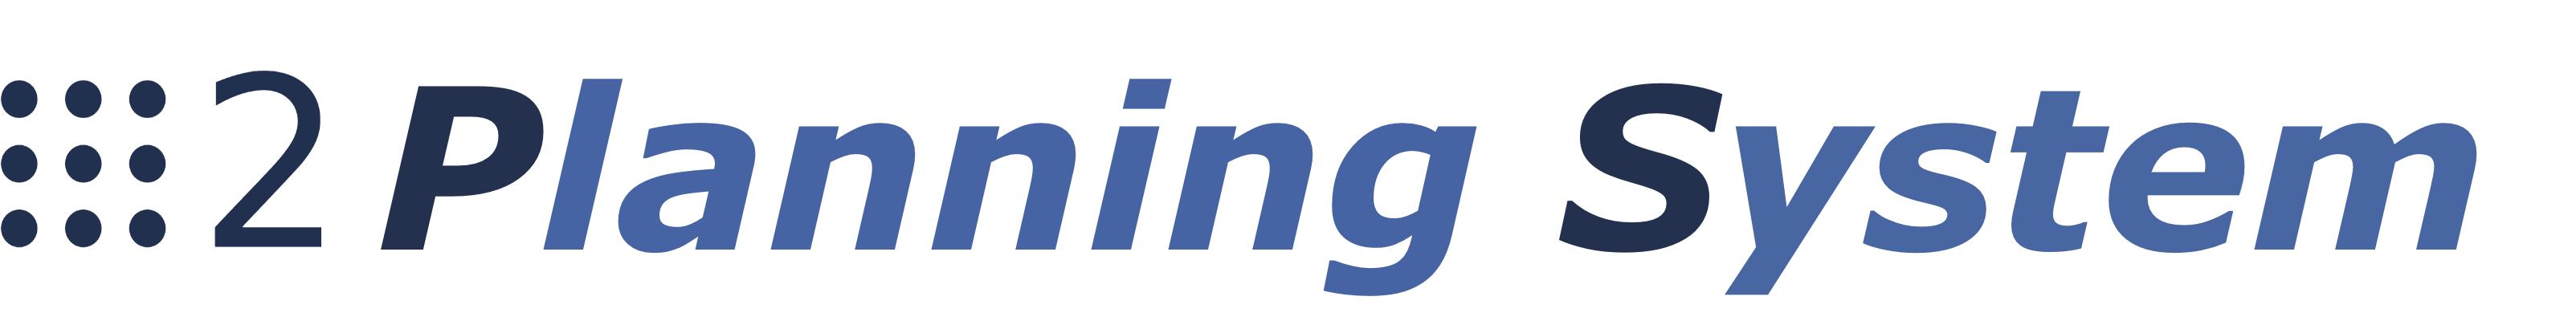 PlanSys2 Logo